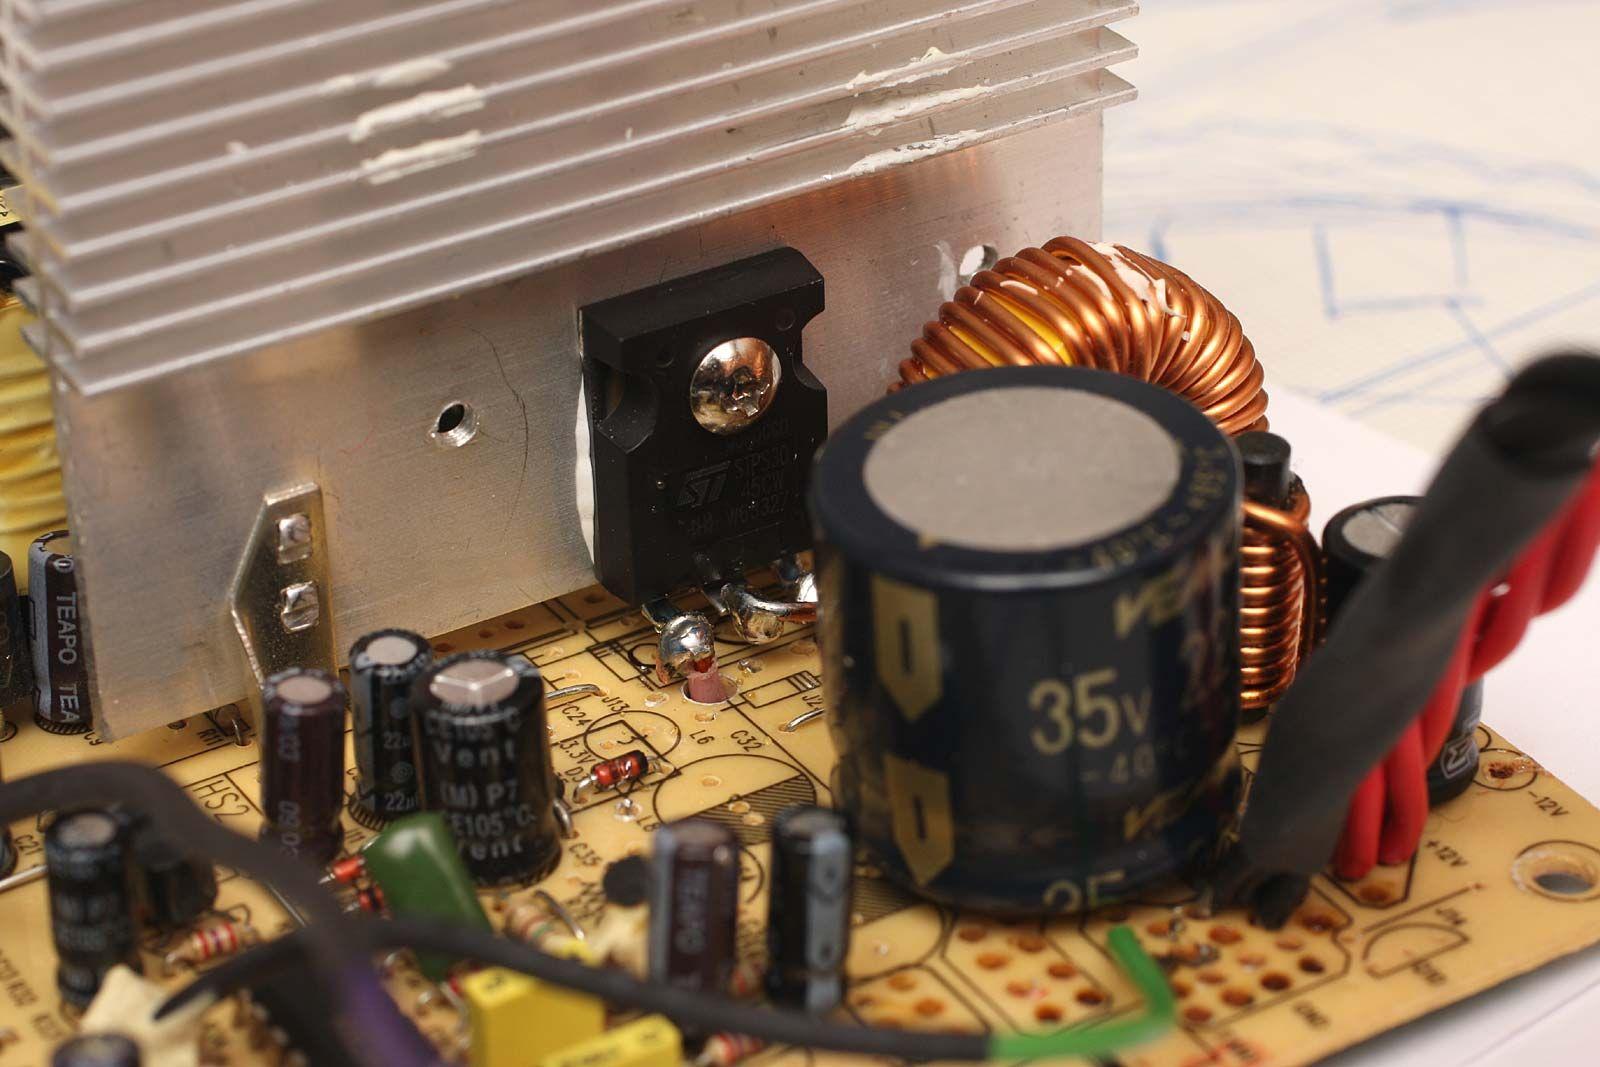 Atx Versione 20a Diodo Stps3045cw Da 30a 45v Usato Per Avere Oltre 125v To 25v 15a Lm317 Power Supply In Uscita